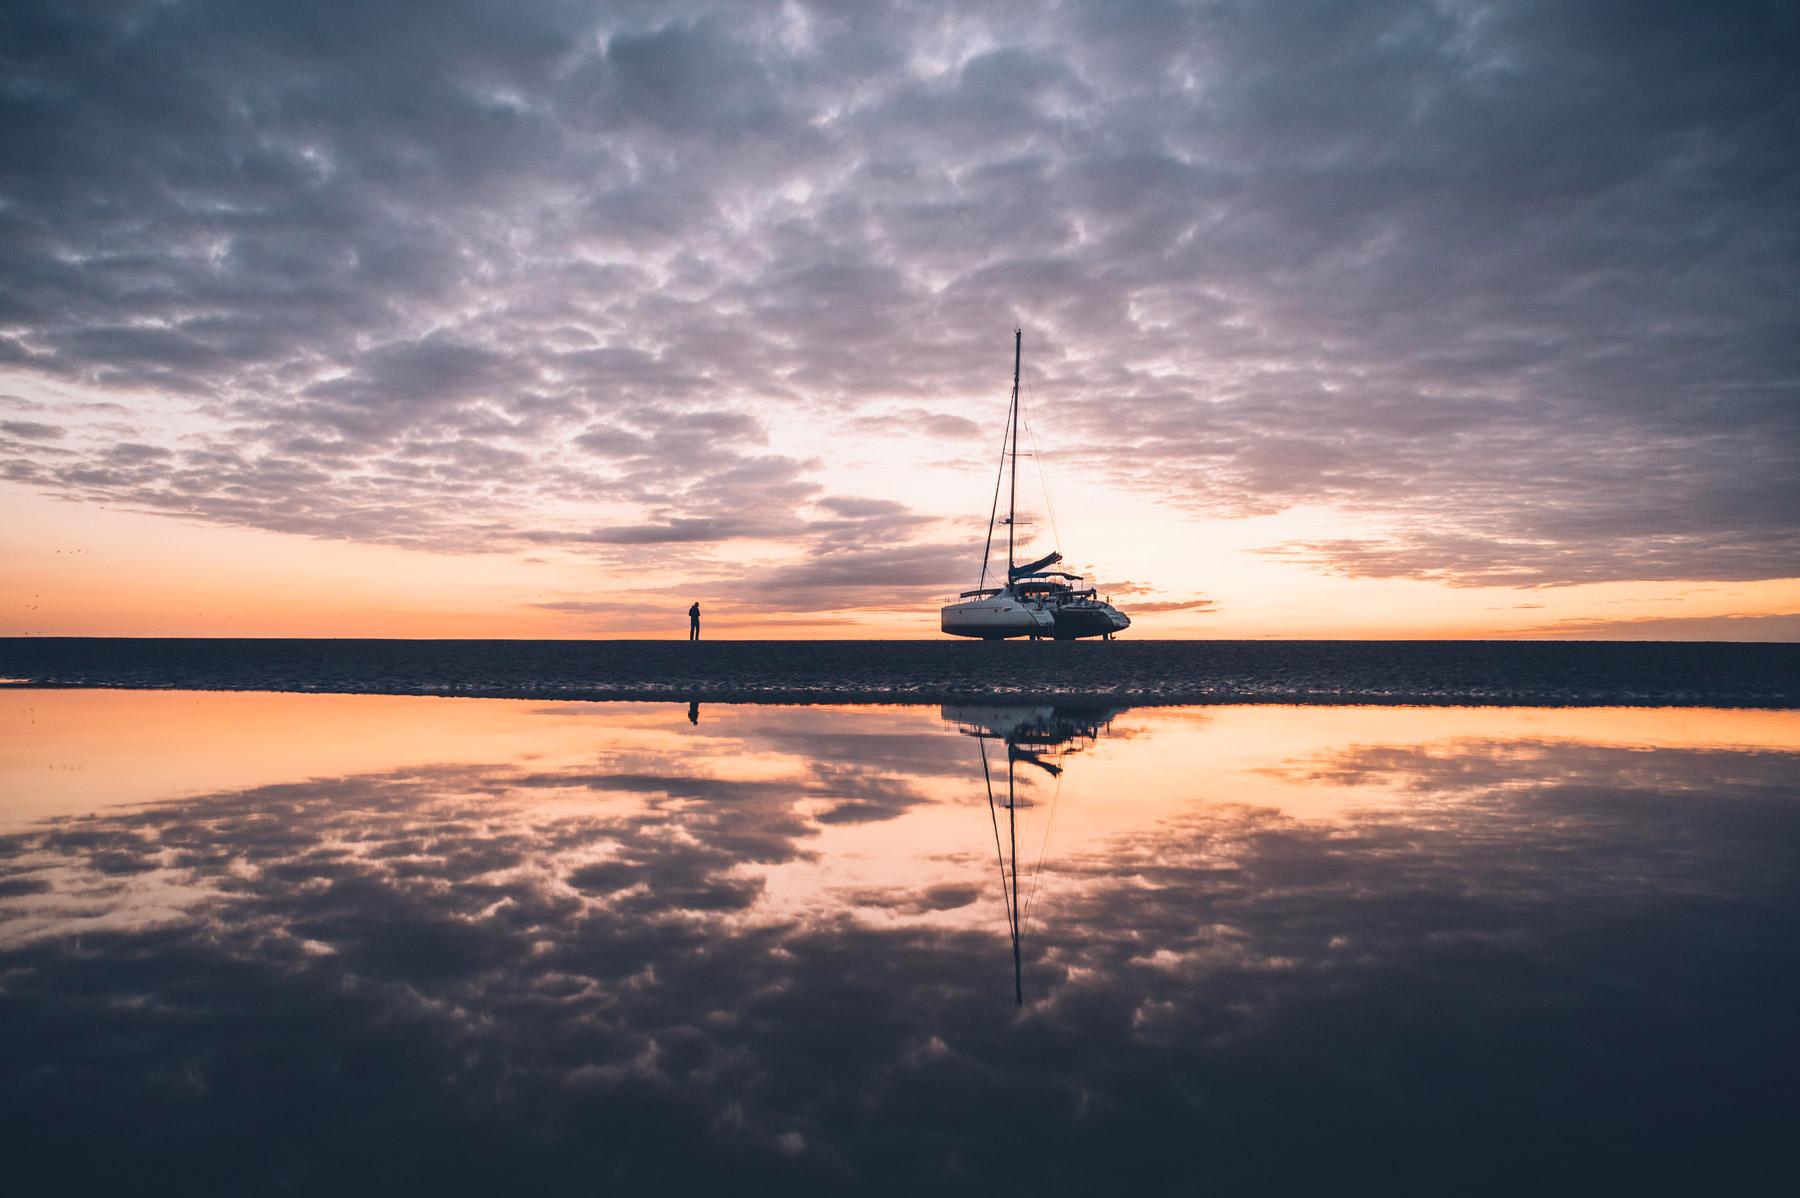 Sortie catamaram Baie de Somme Nuit